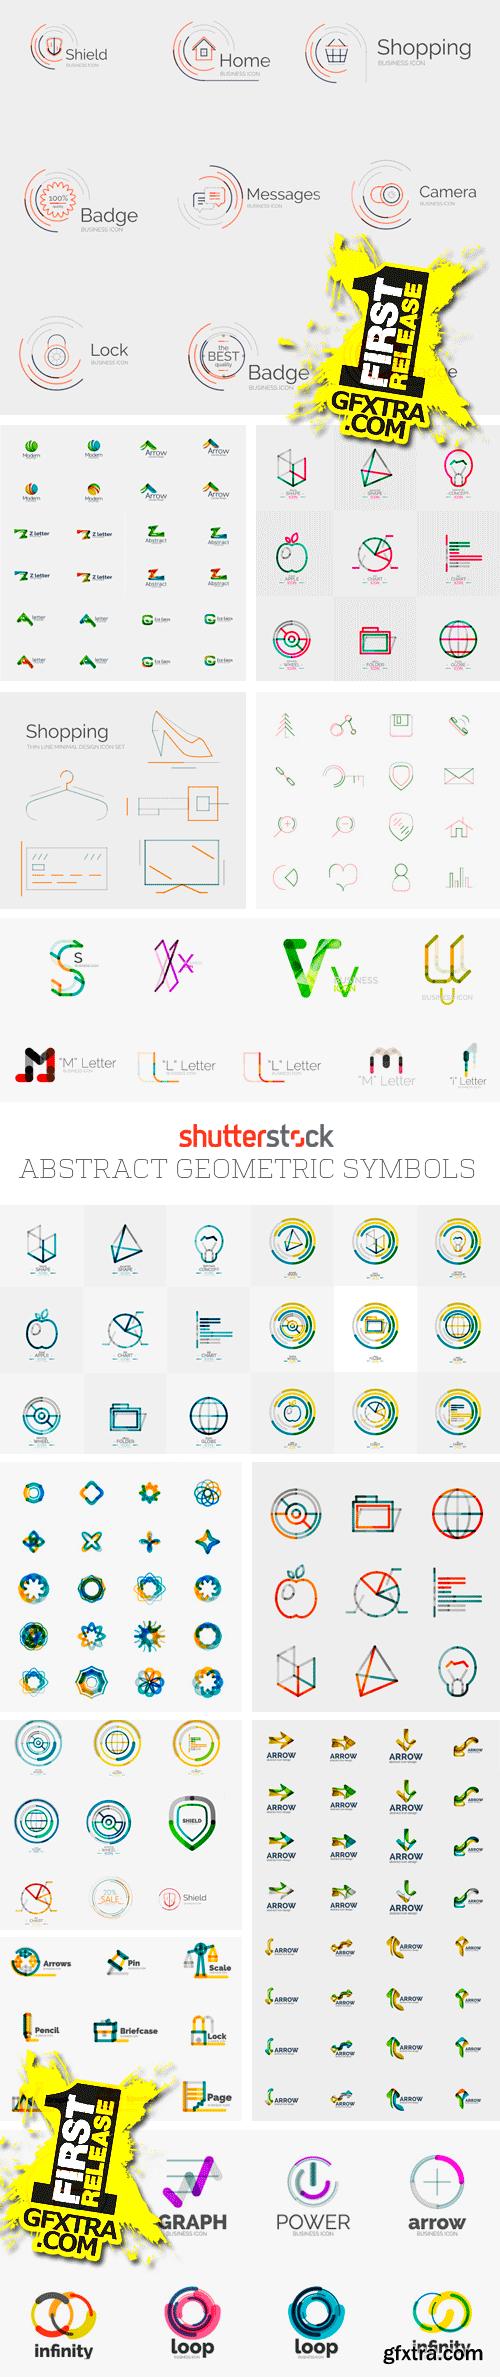 Amazing SS - Abstract Geometric Symbols, 30xEPS